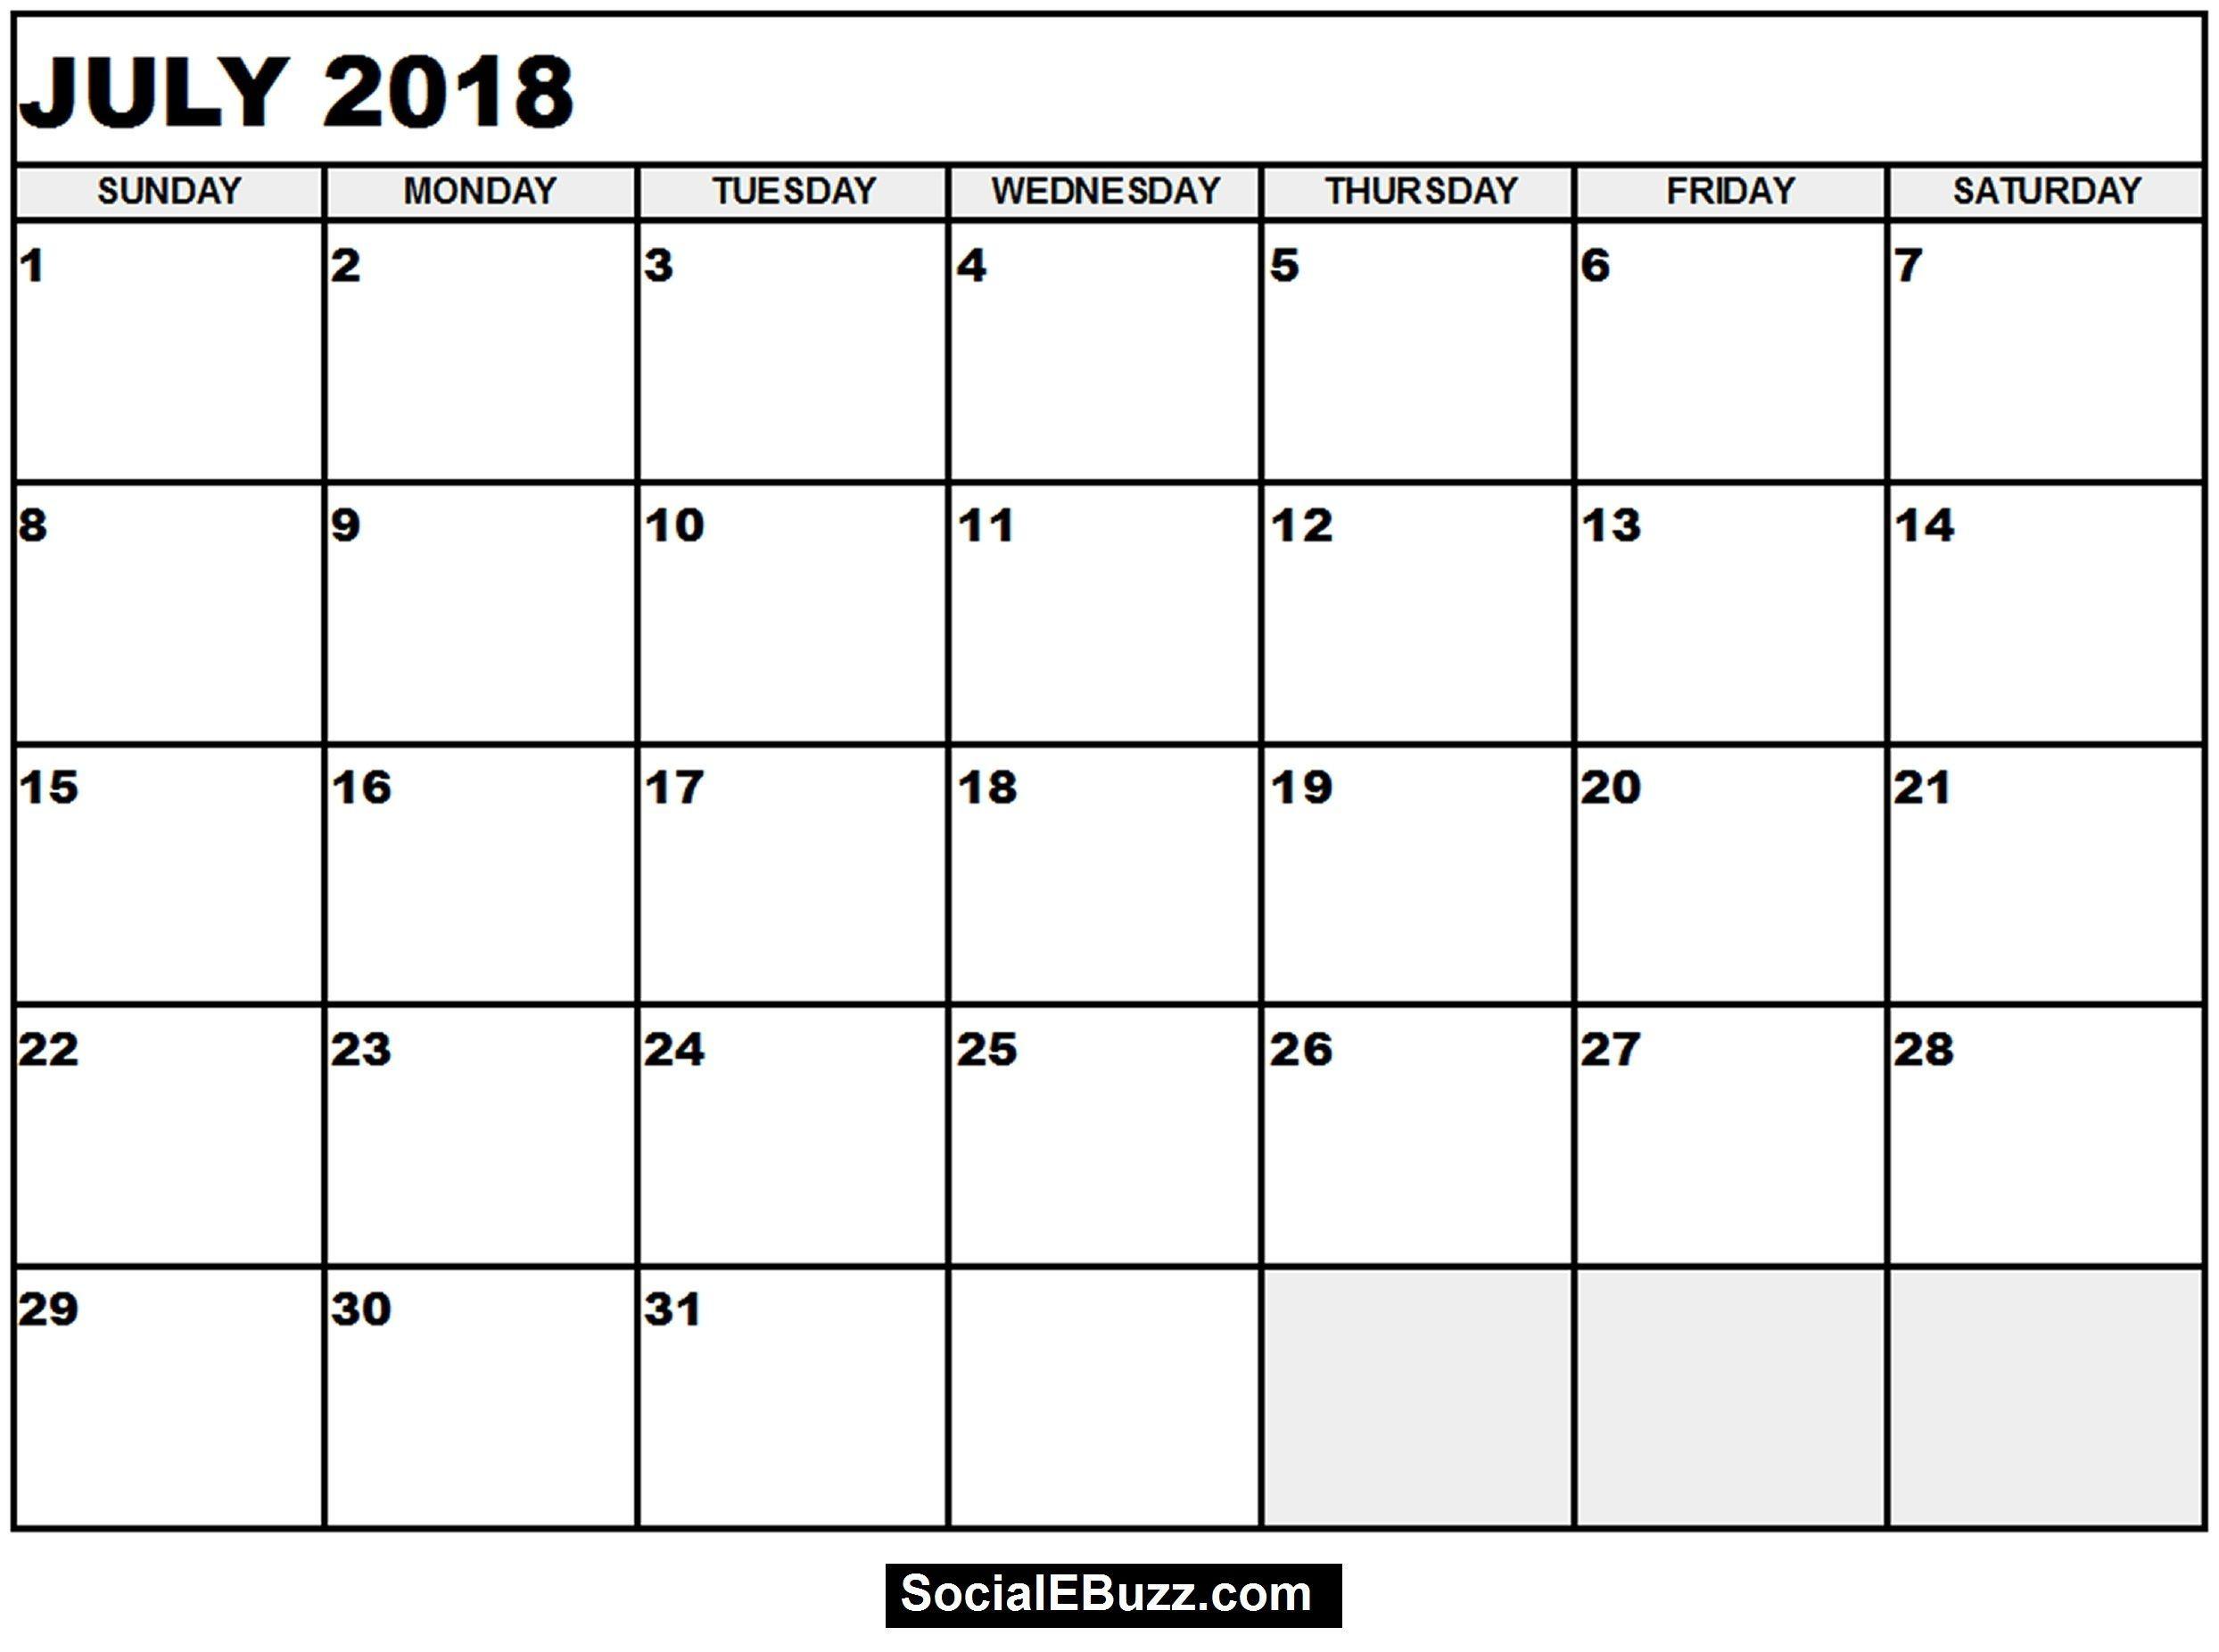 Pincalendar Printable On July 2018 Calendar Pinterest Catch